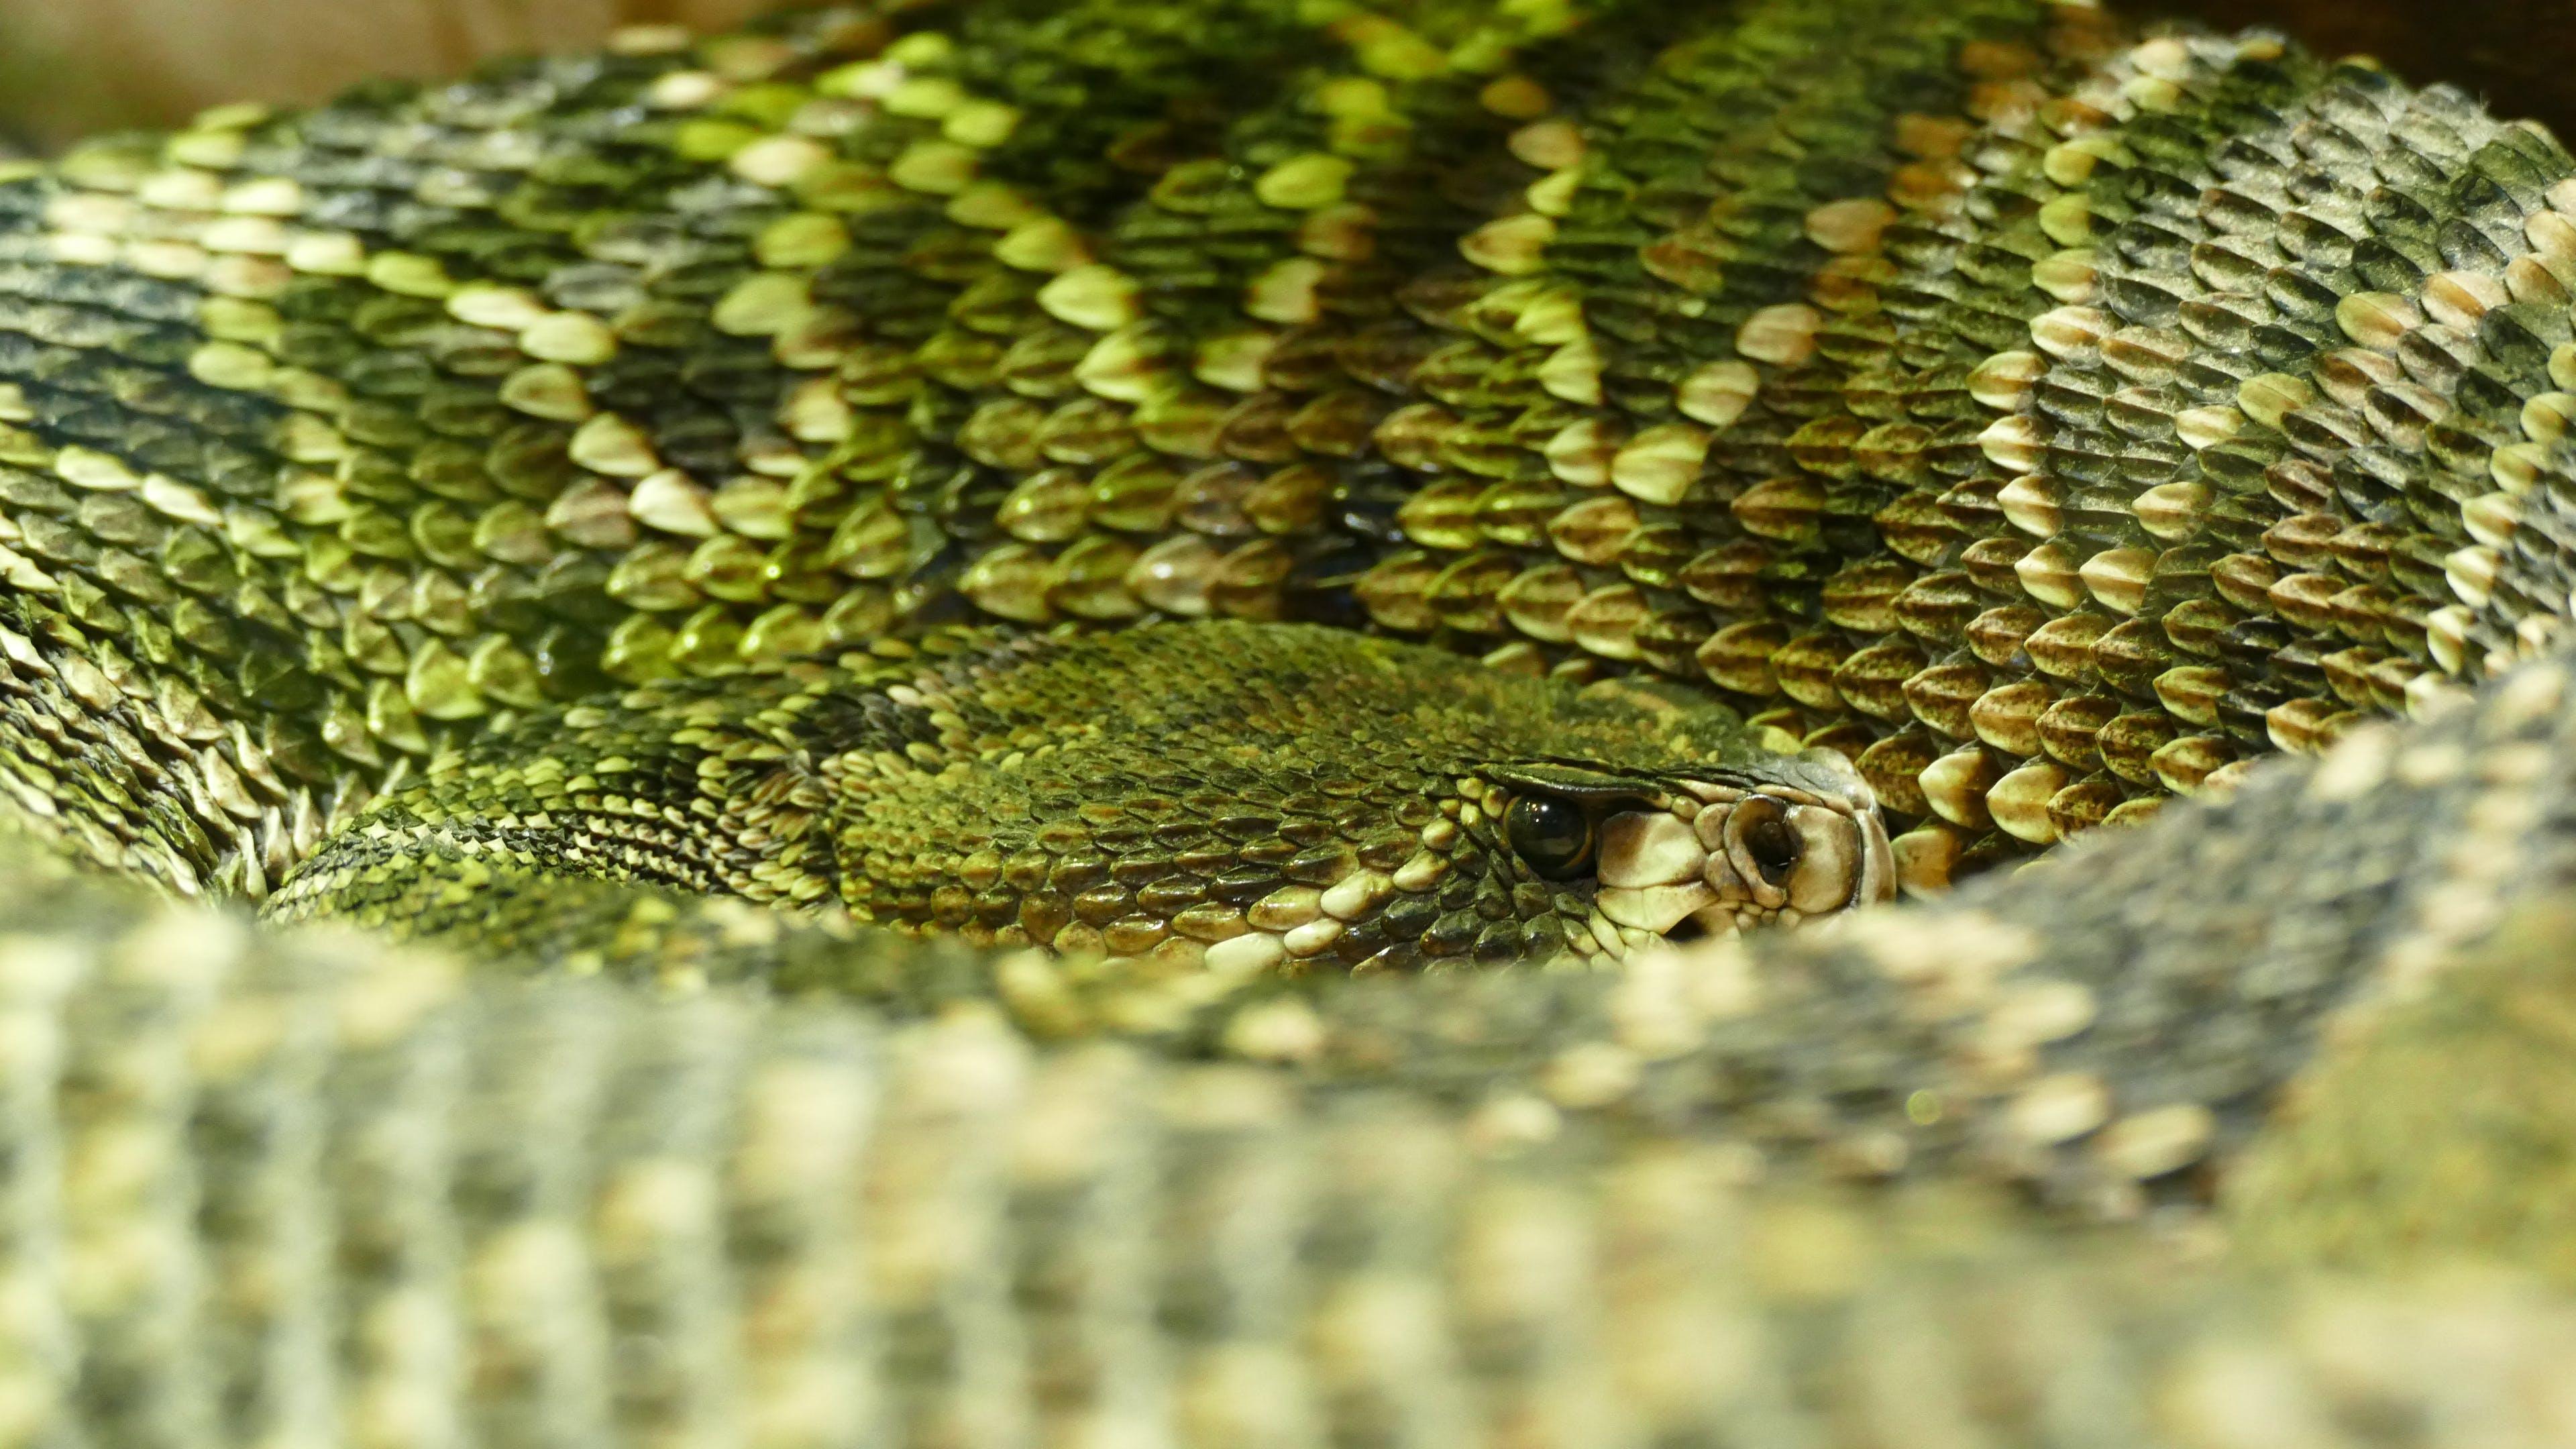 Free stock photo of nature, pattern, animal, dangerous